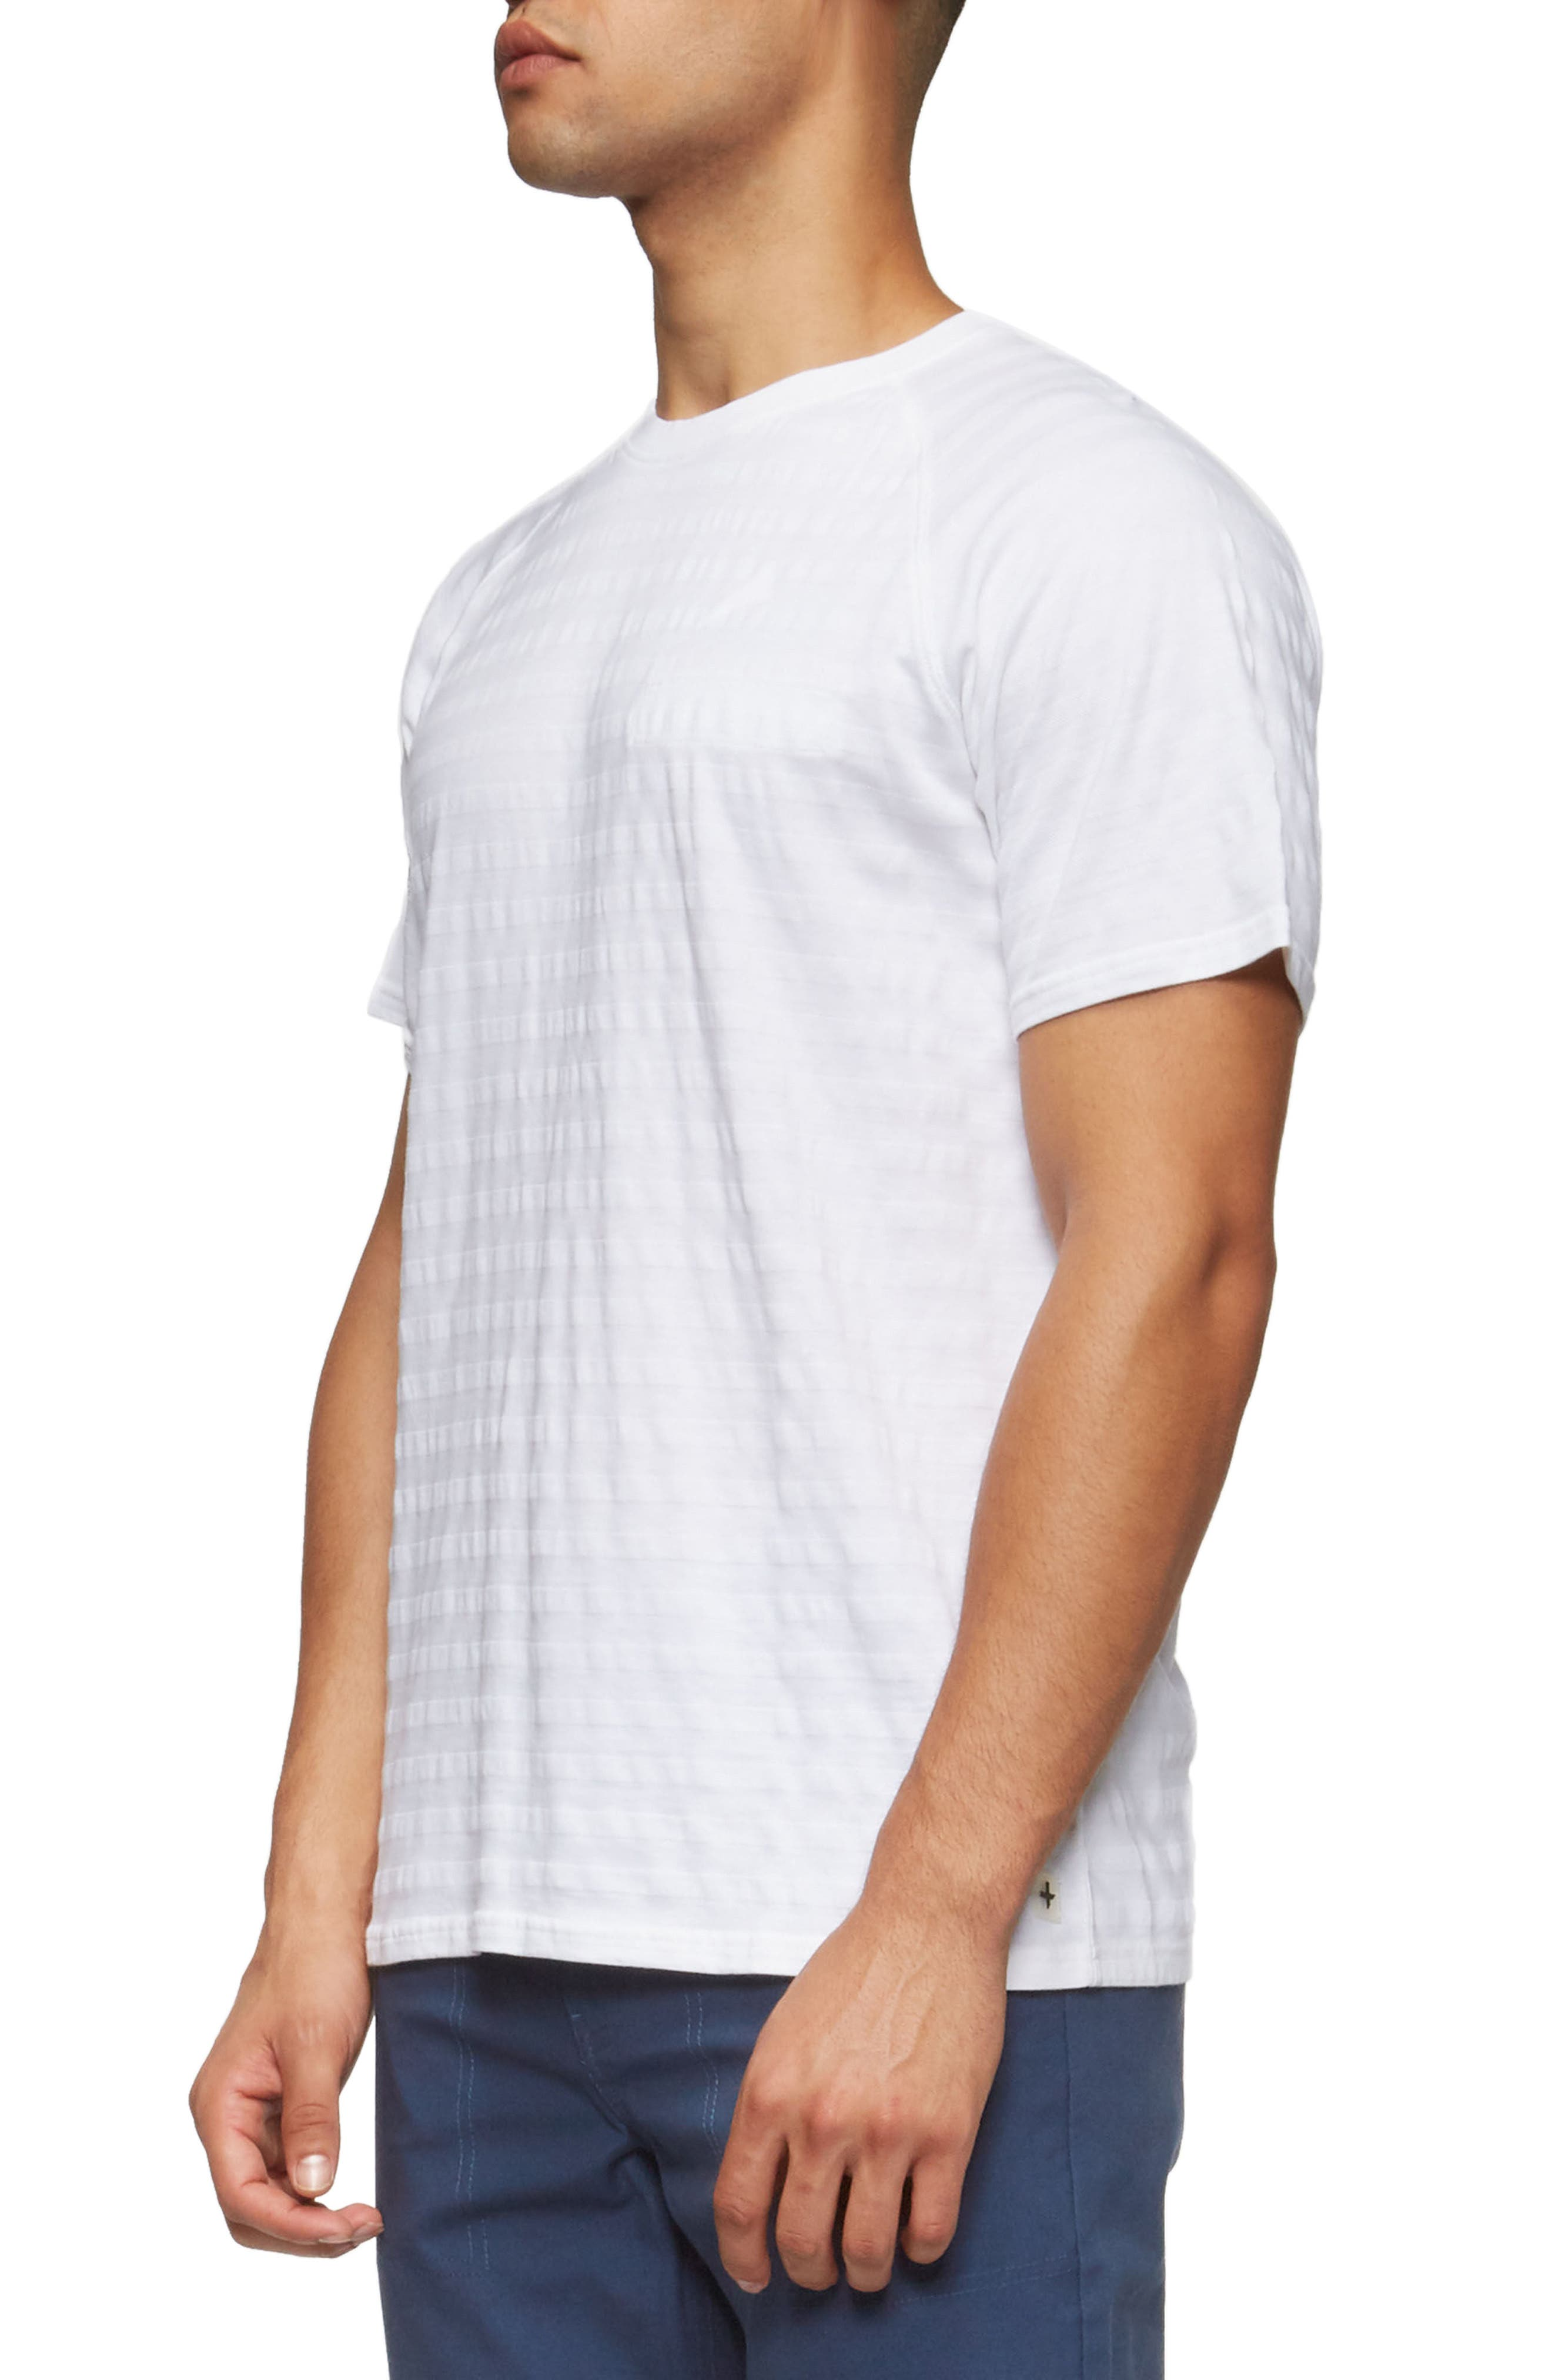 Modus T-Shirt,                             Alternate thumbnail 3, color,                             White